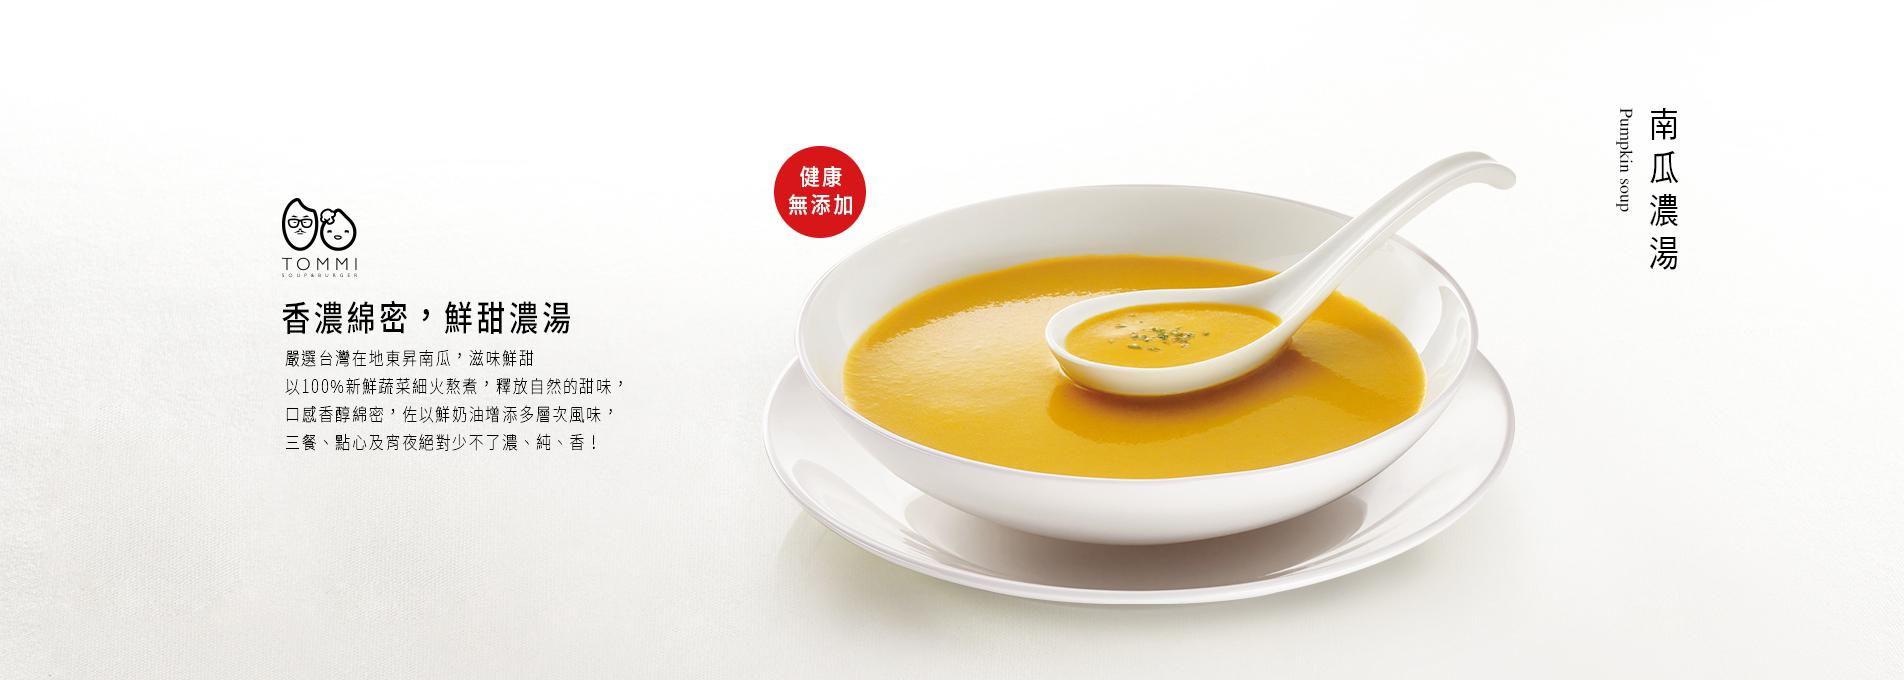 TOMMI湯米 南瓜濃湯(10入)